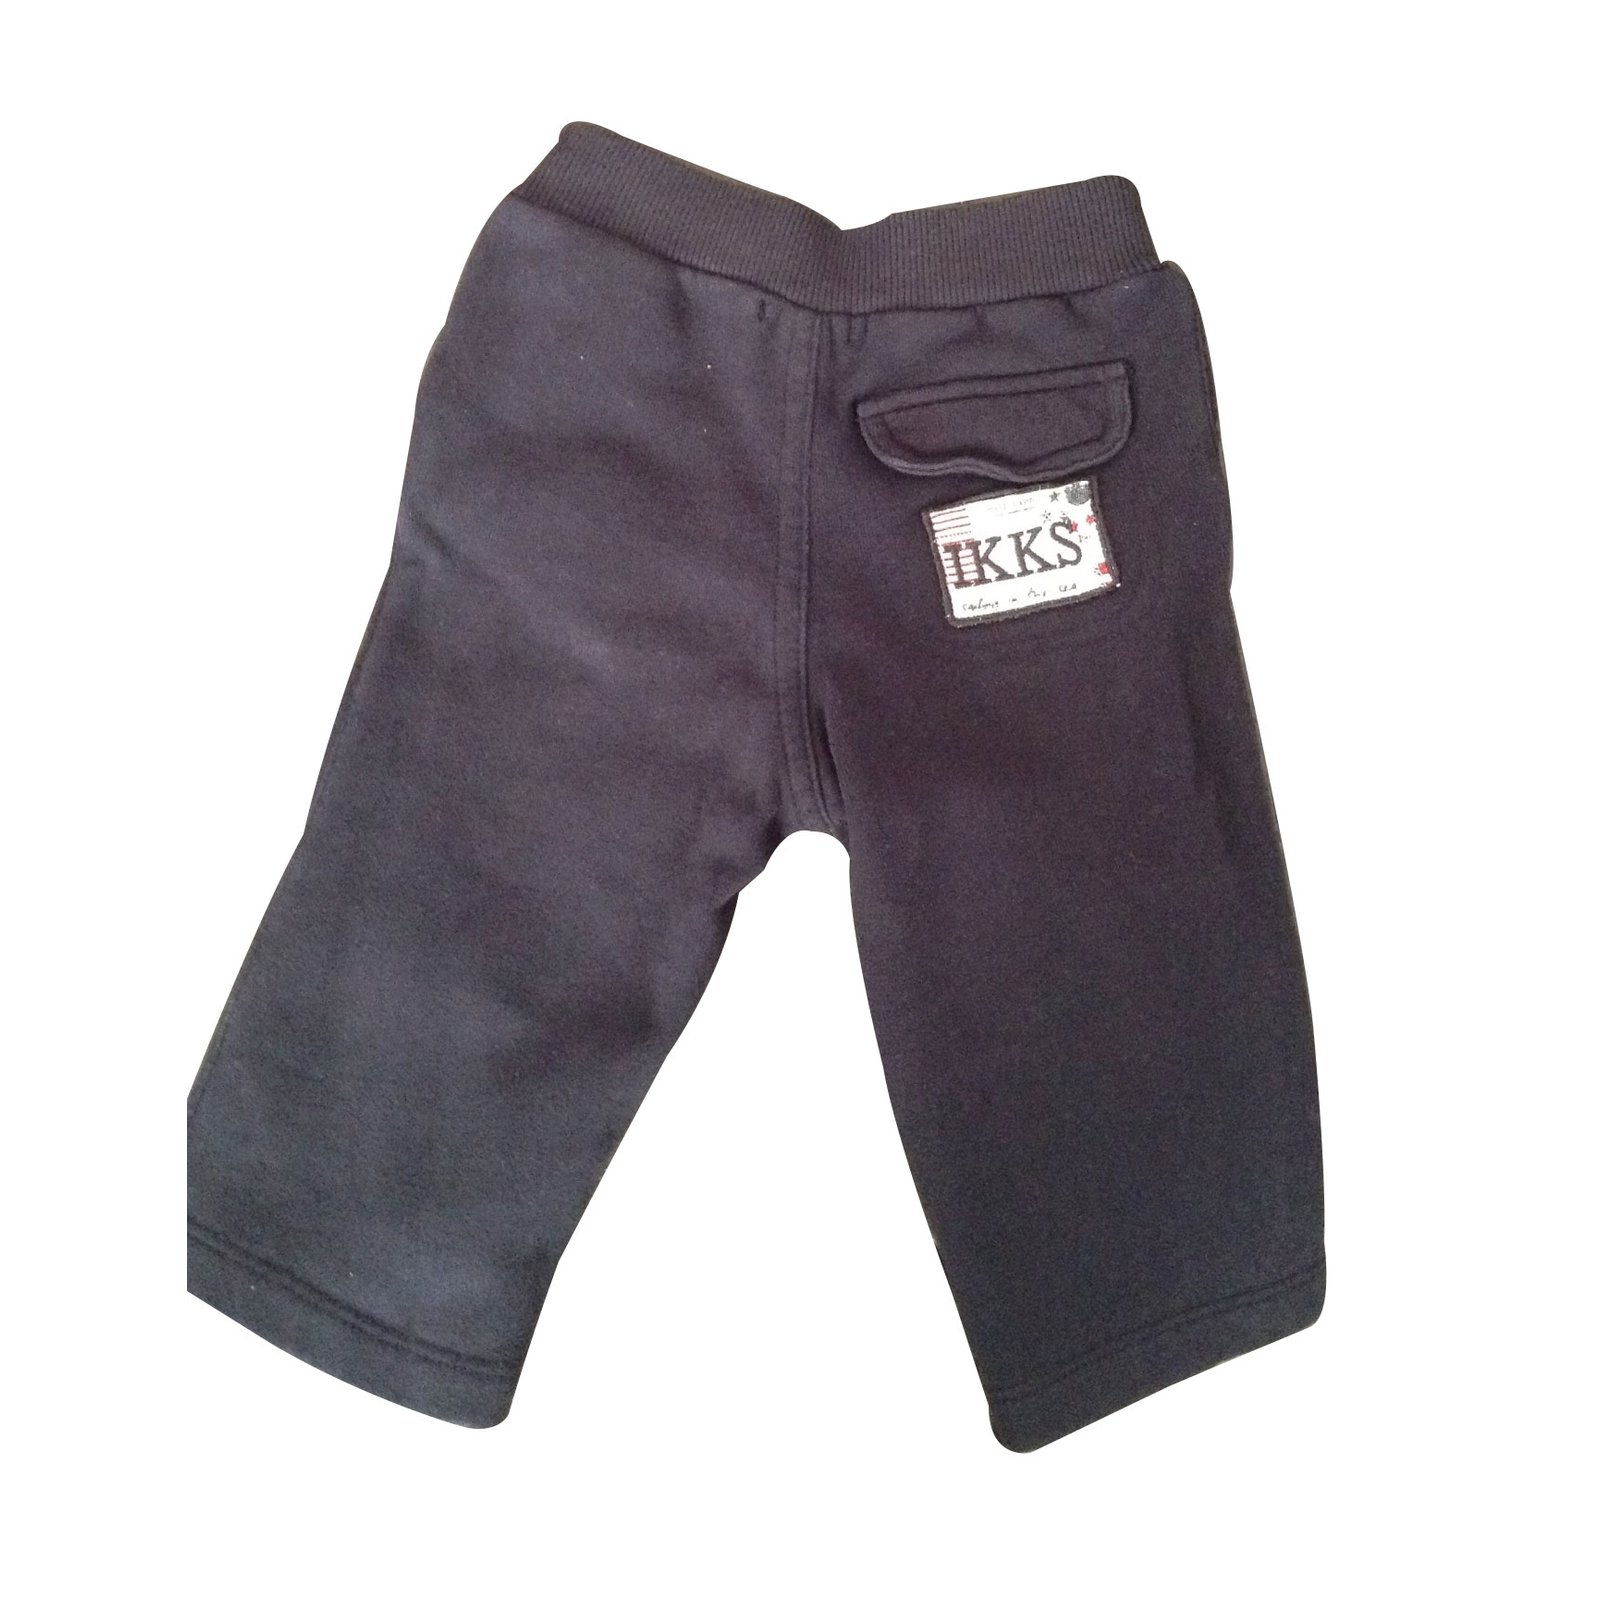 IKKS Pantalon Detente Marine Gar/çon